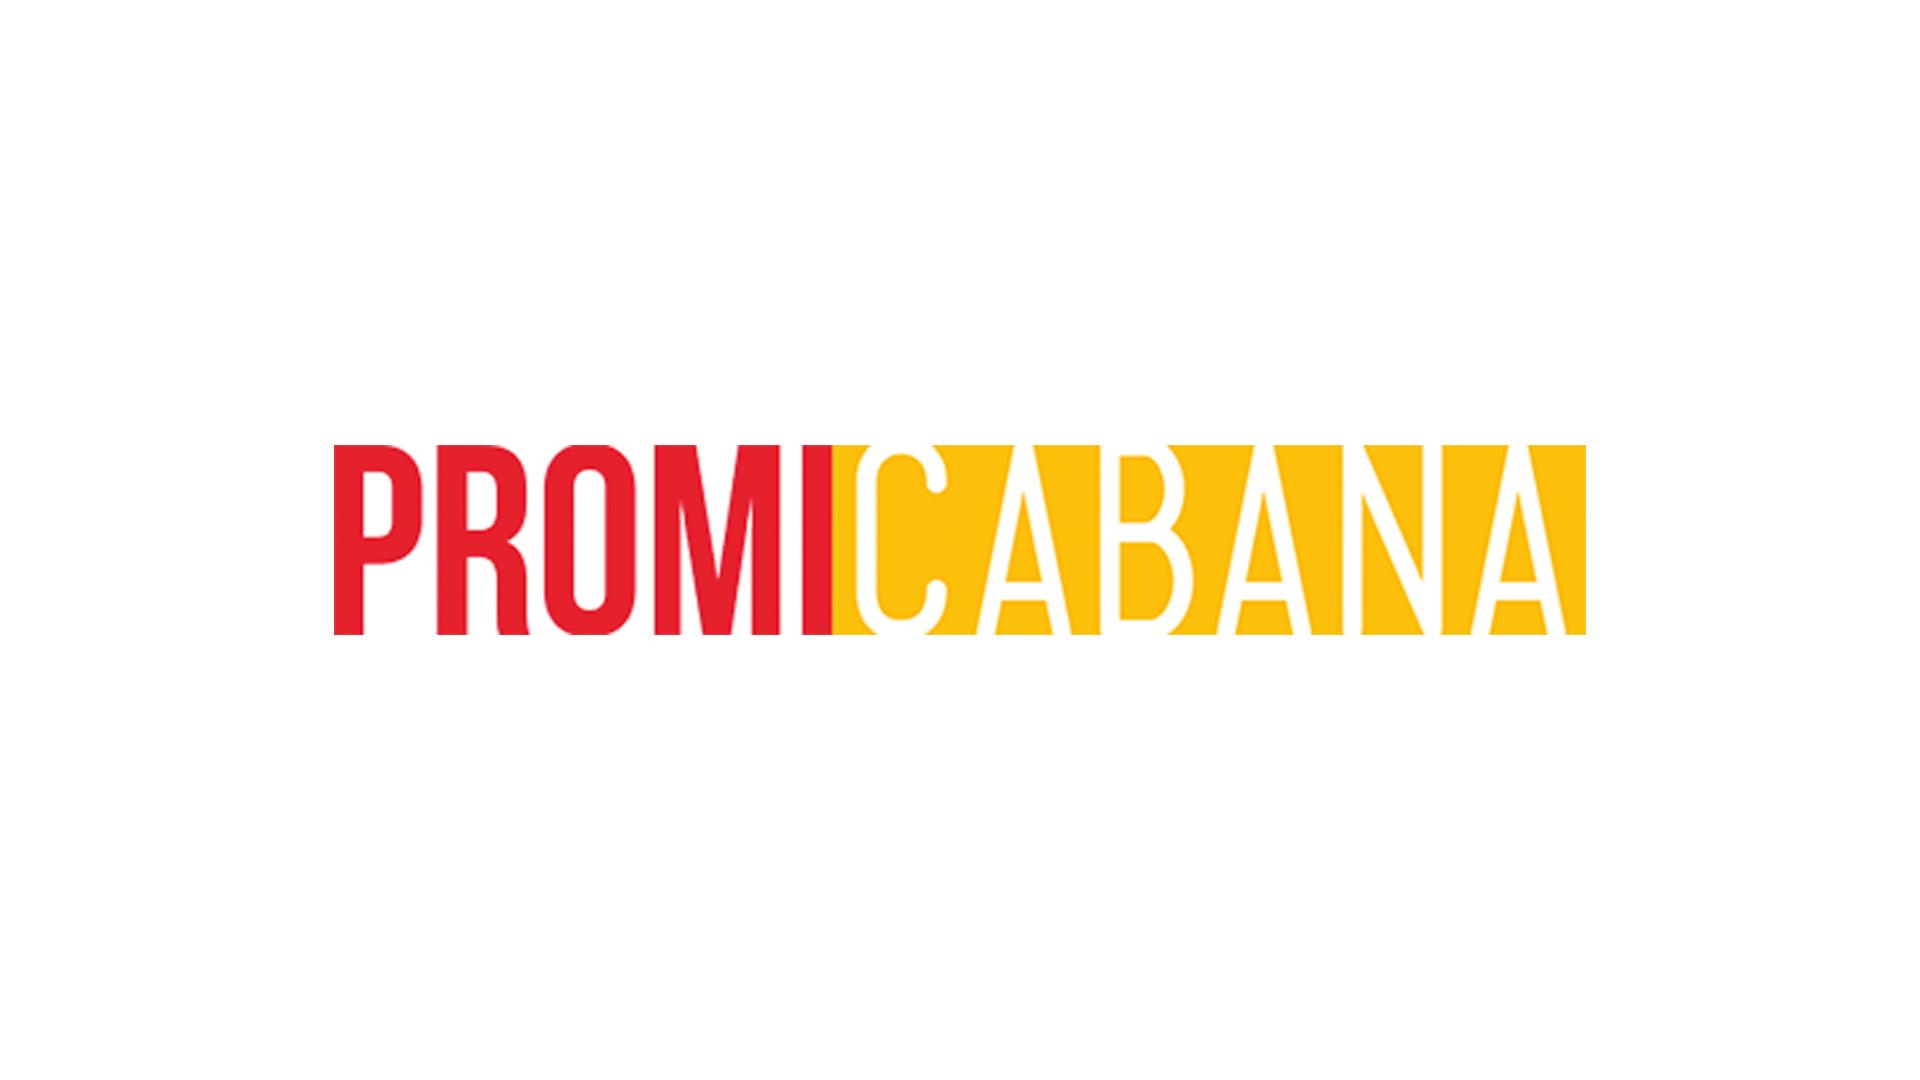 Liam-Hemsworth-Woody-Harrelson-The-DUel